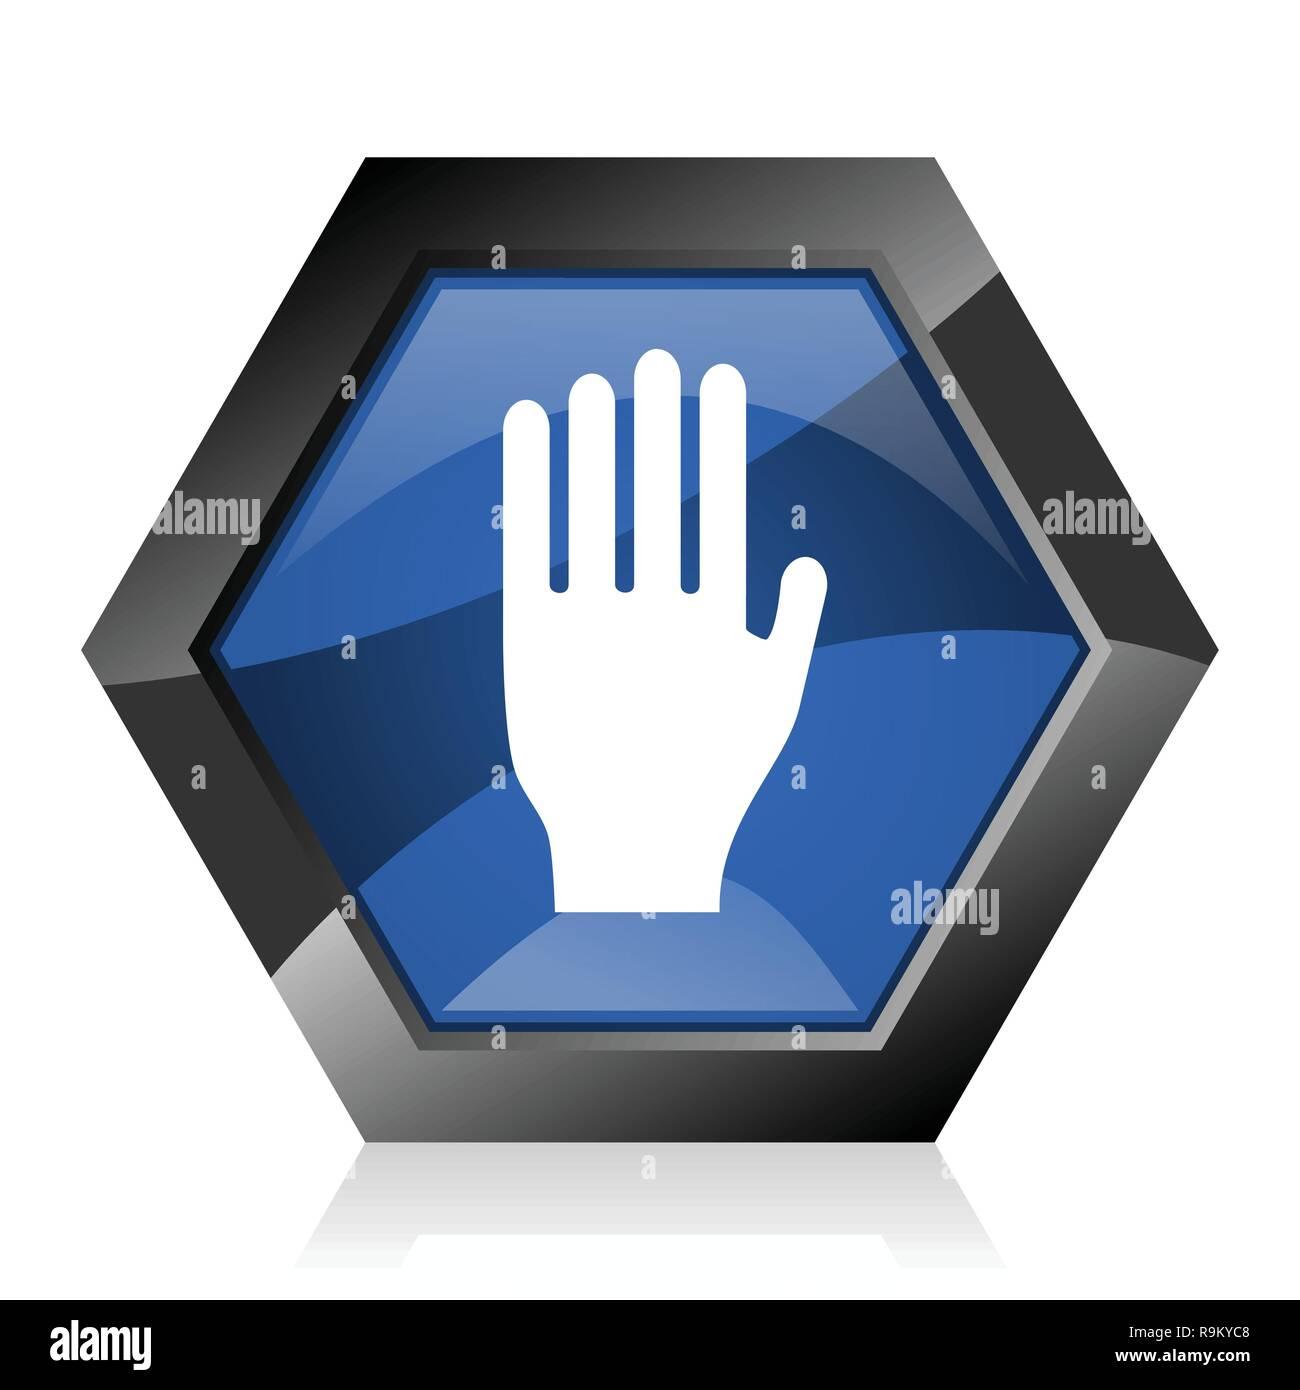 Stop dark blue glossy hexagon geometric diamond vector web icon with reflection on white background. Modern design hexagonal internet button. - Stock Image